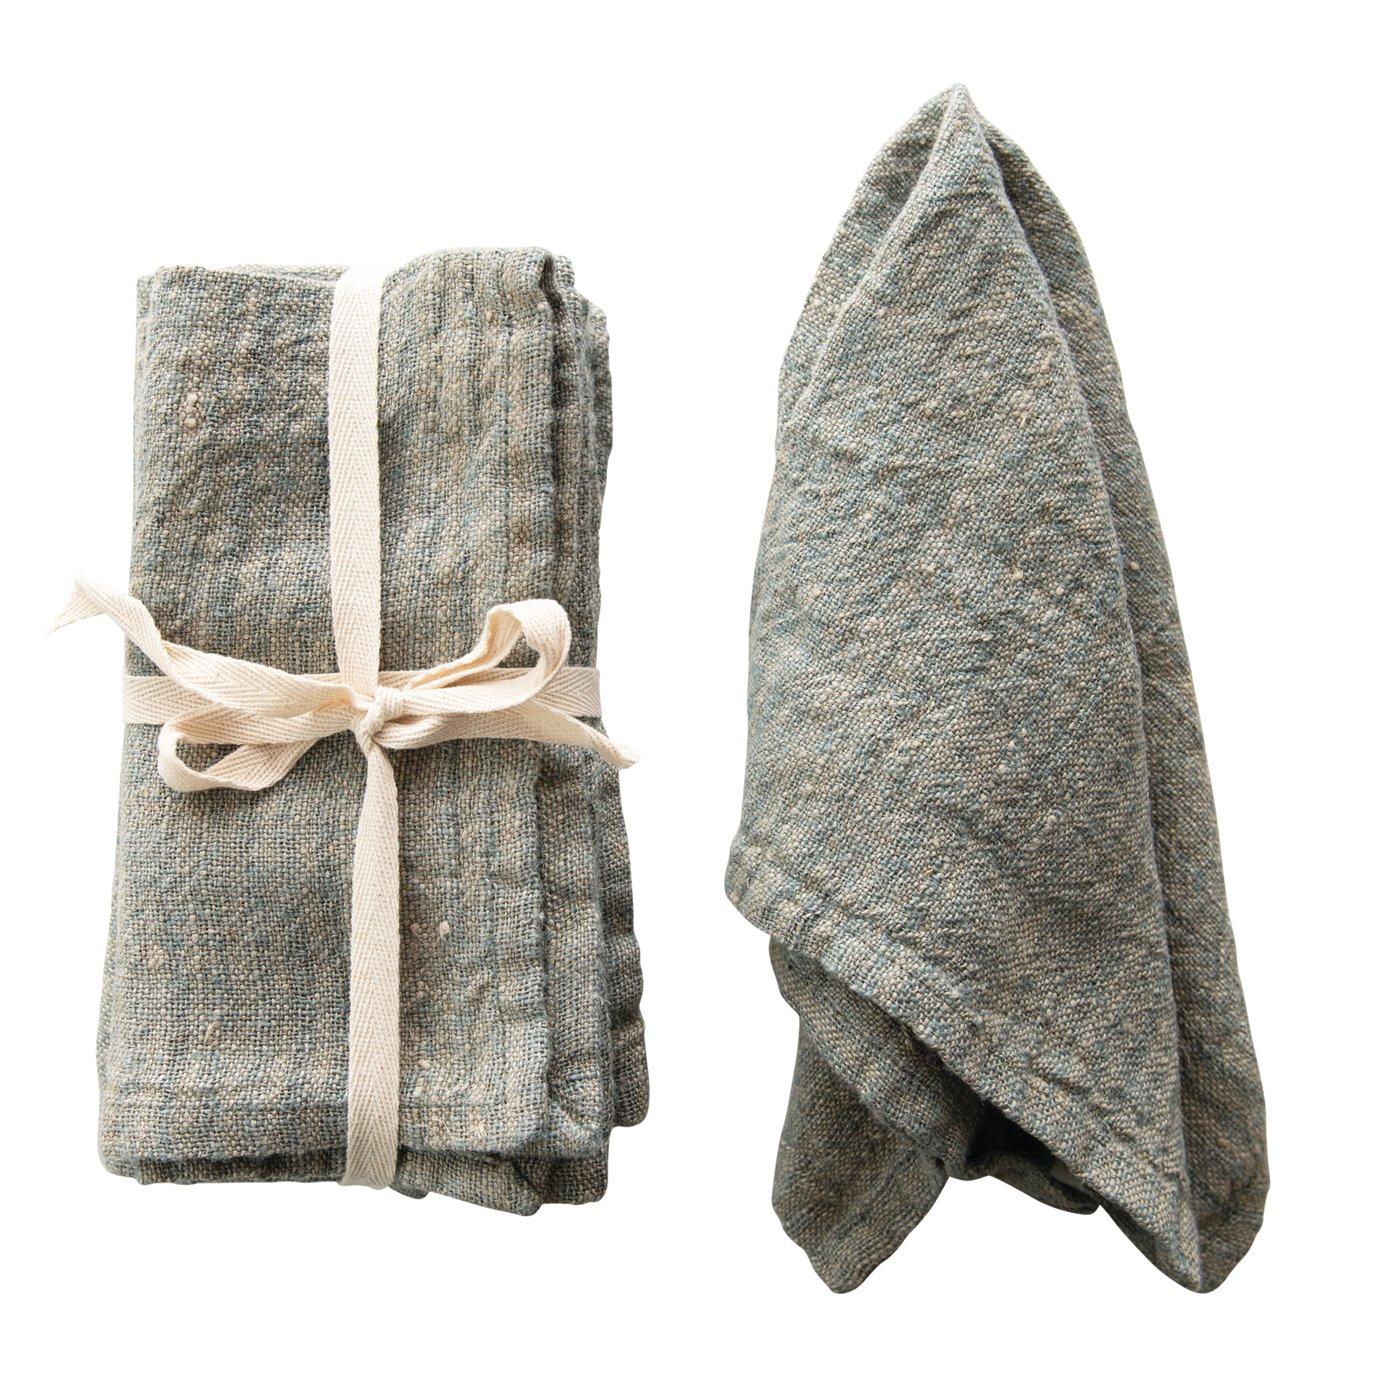 Blue Square Woven Striped Linen Napkin (Set of 4)